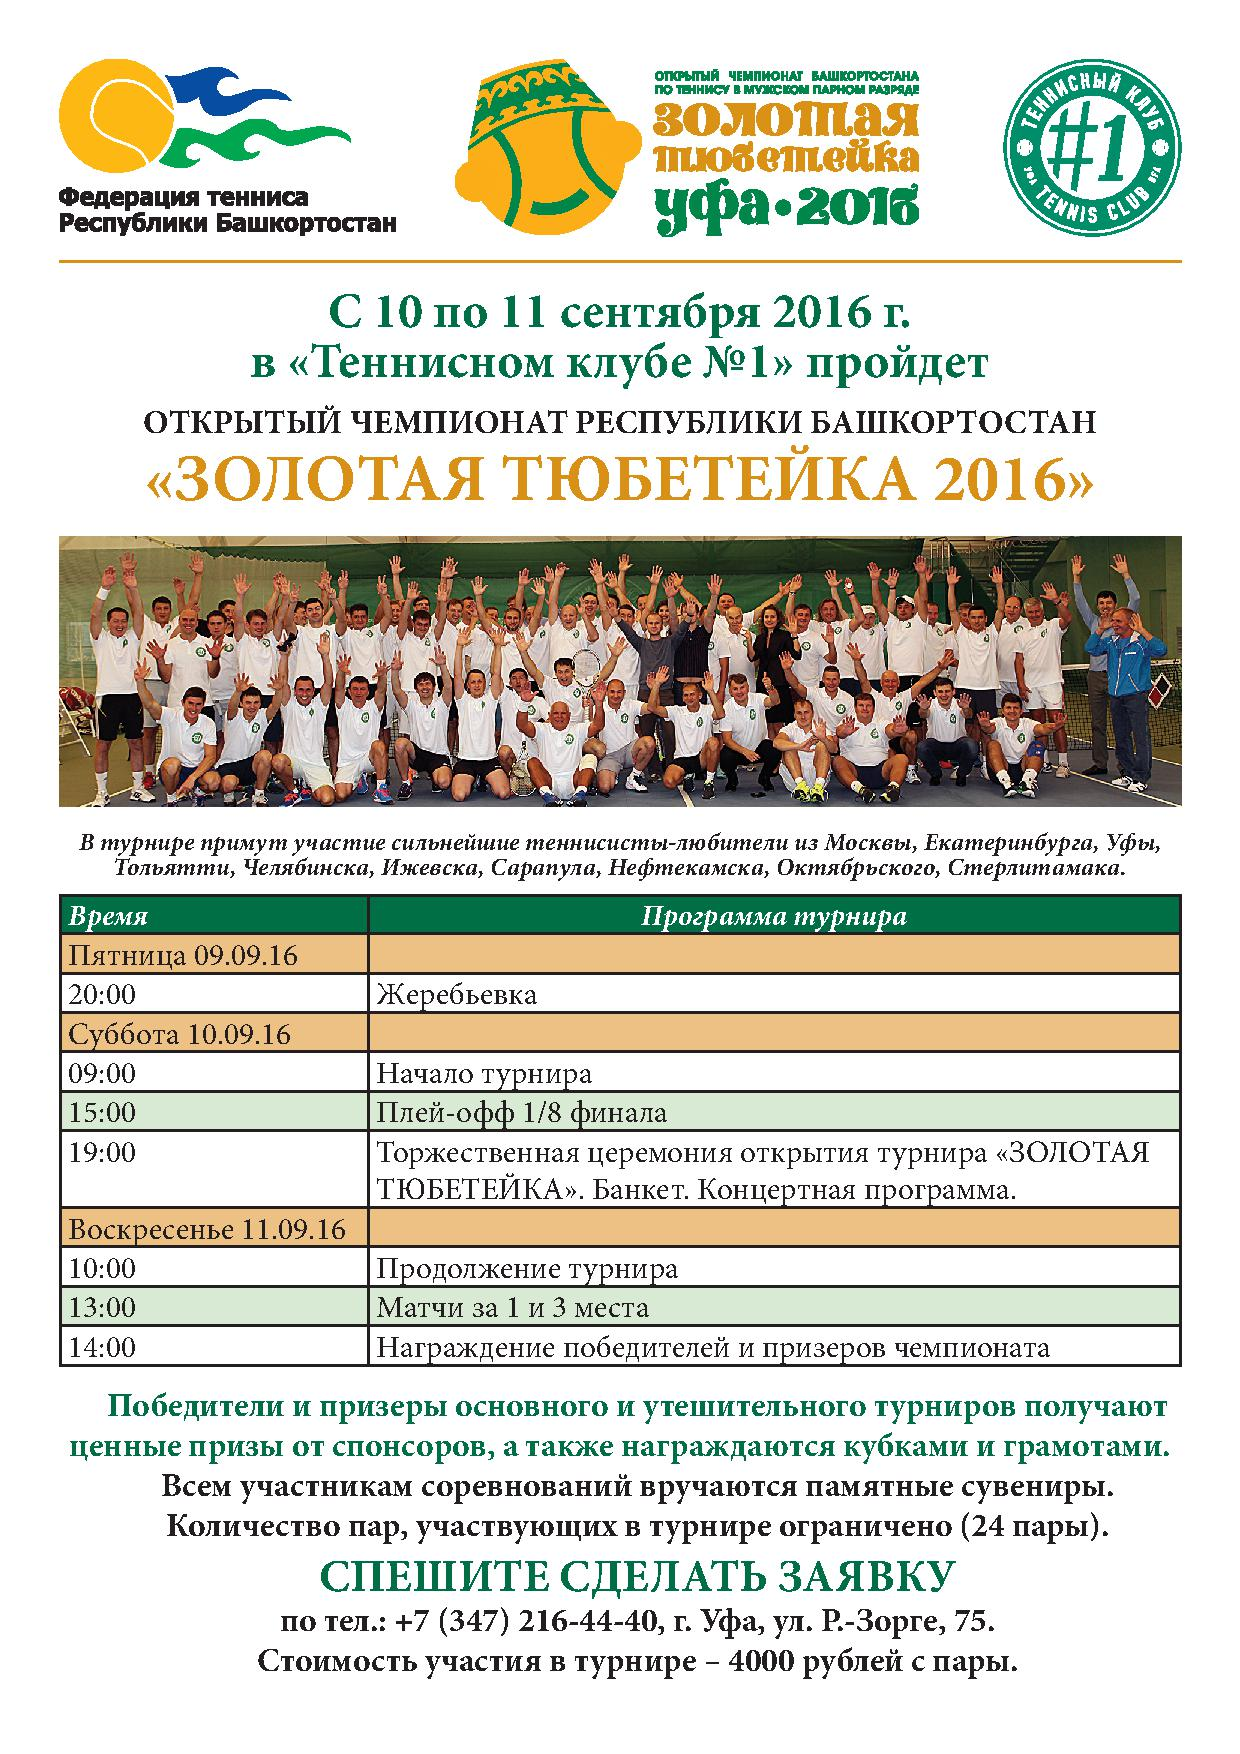 Объявление А4 Золотая Тюбетейка 2016